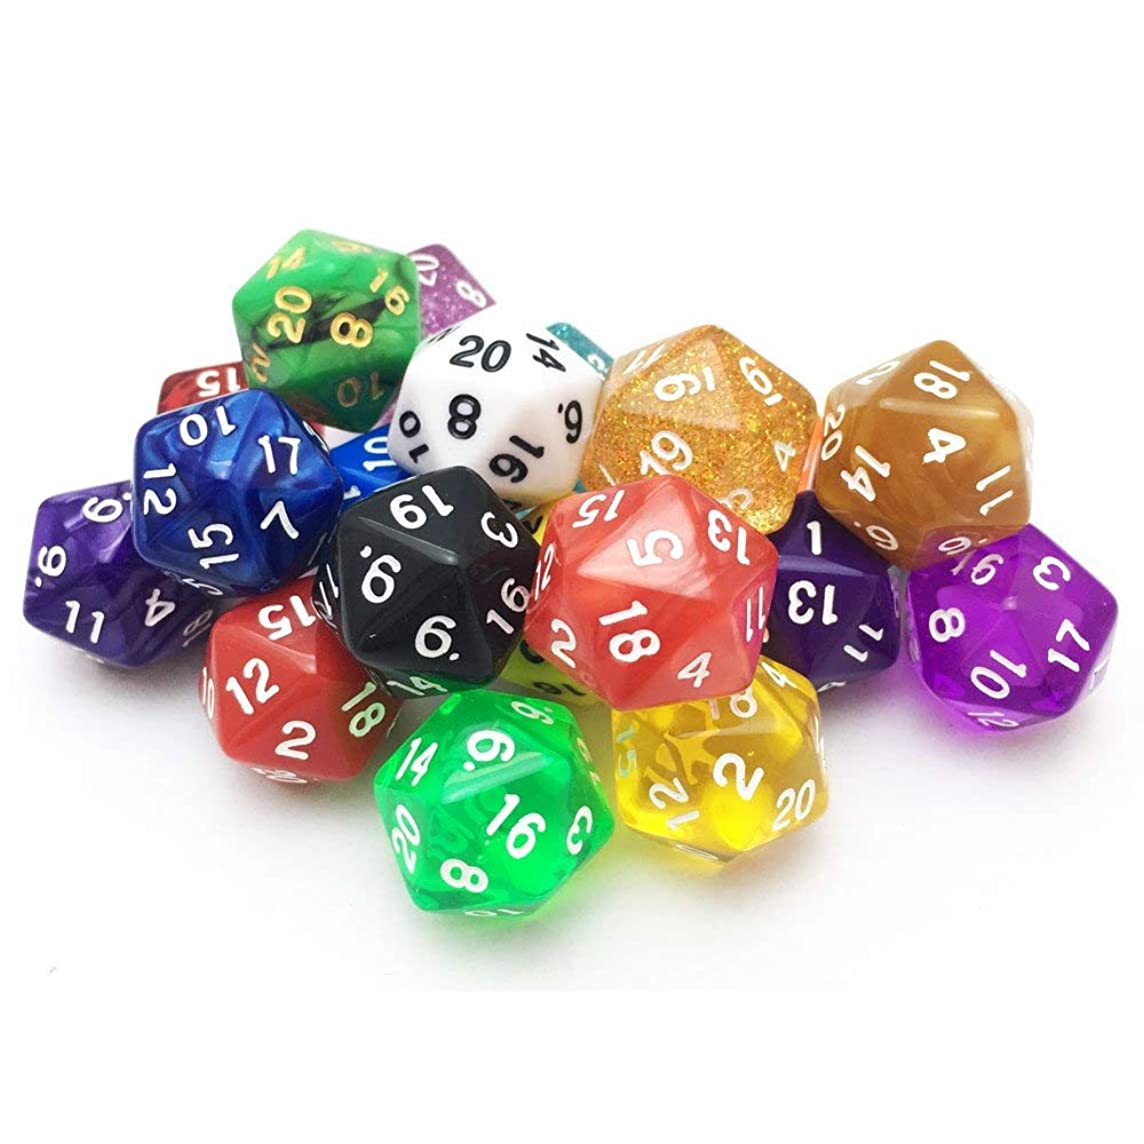 Smartdealspro 10 Pack of Random Color D20 Polyhedral Dice DND RPG MTG Table Games